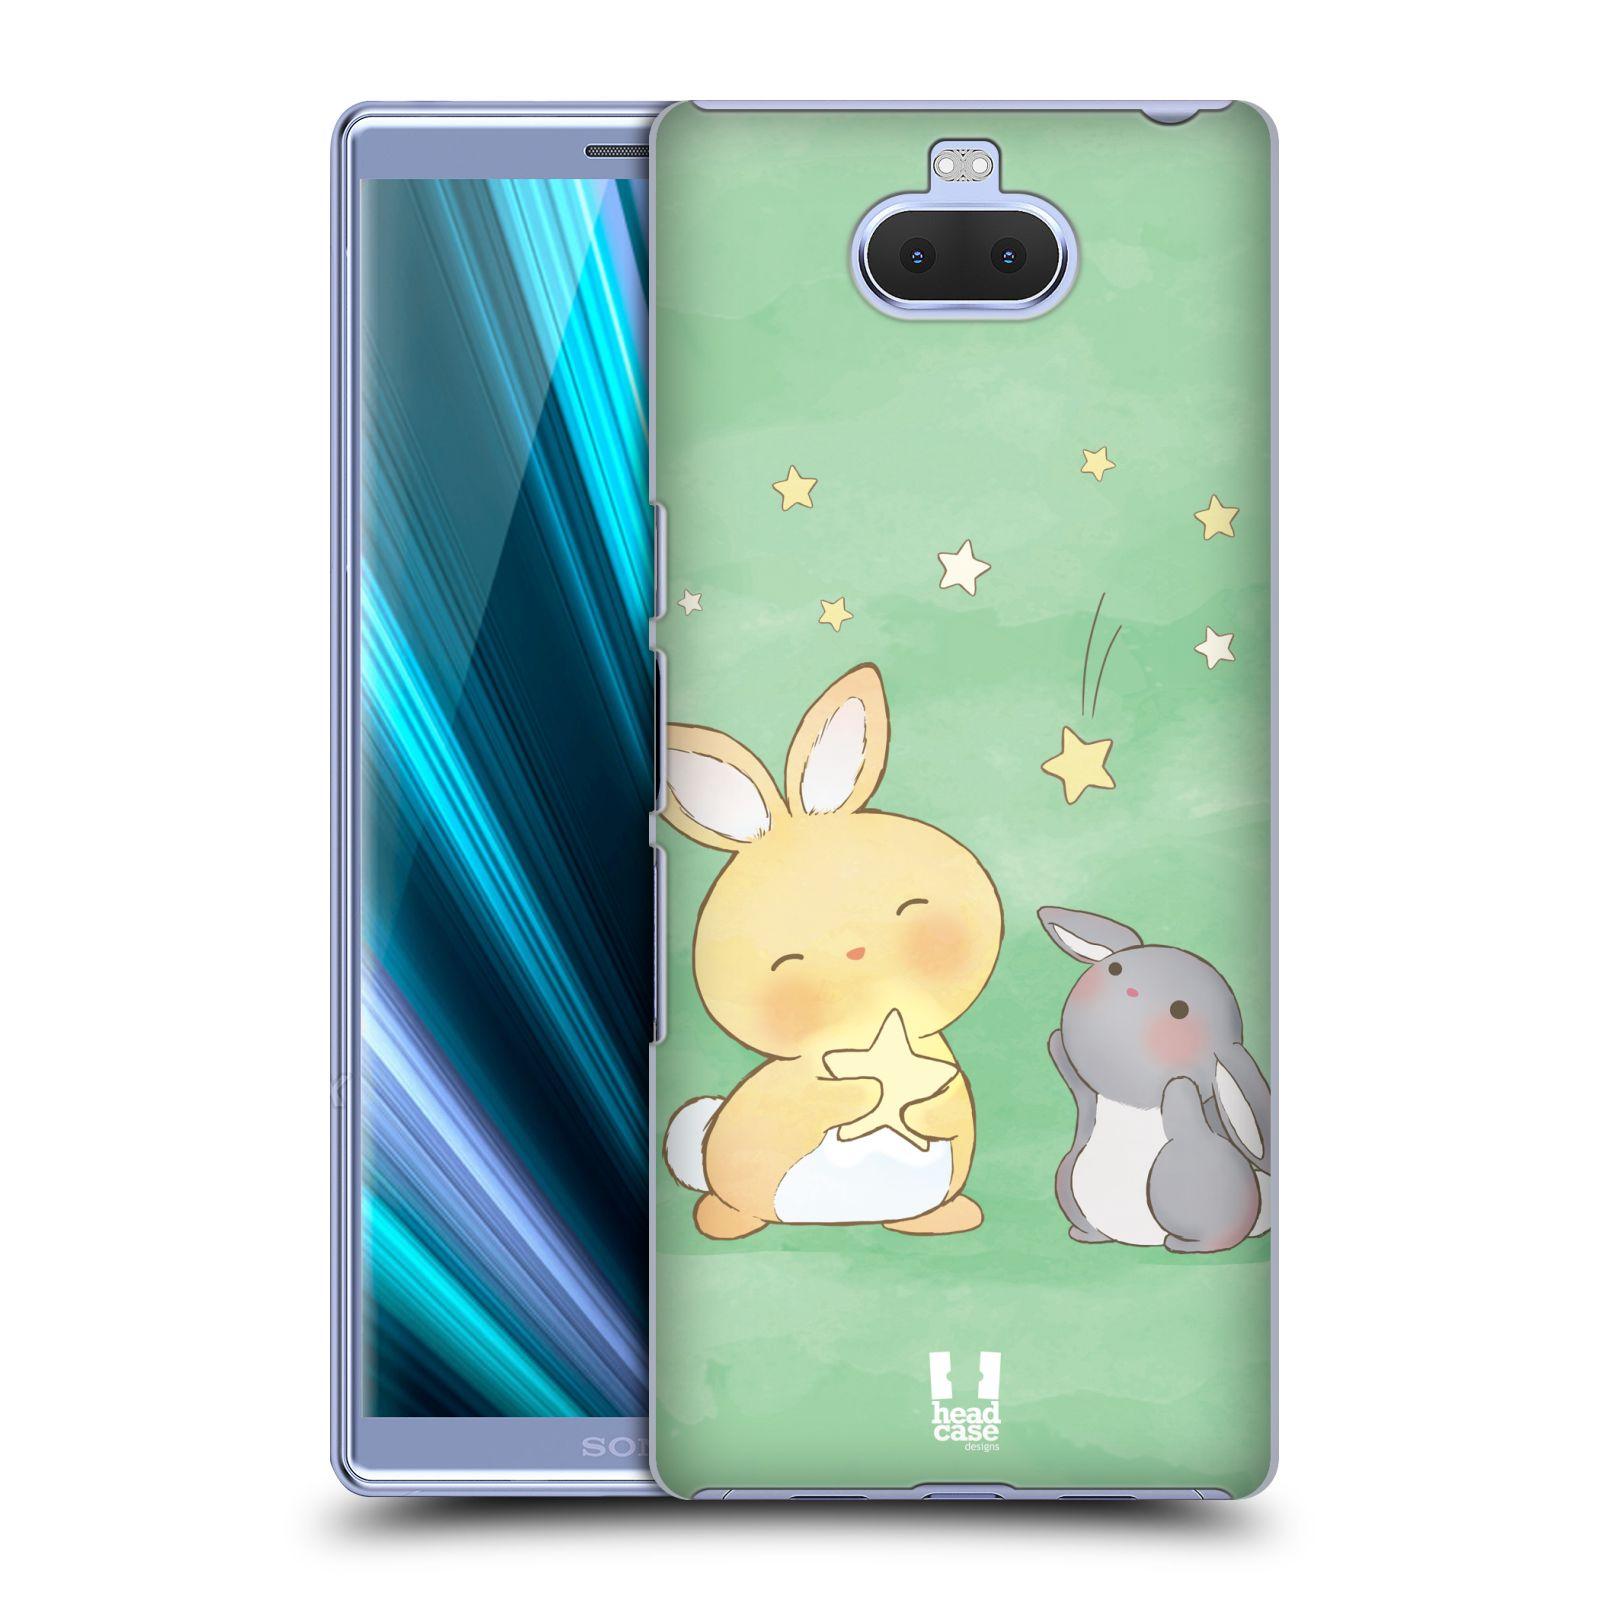 Pouzdro na mobil Sony Xperia 10 - Head Case - vzor králíček a hvězdy zelená